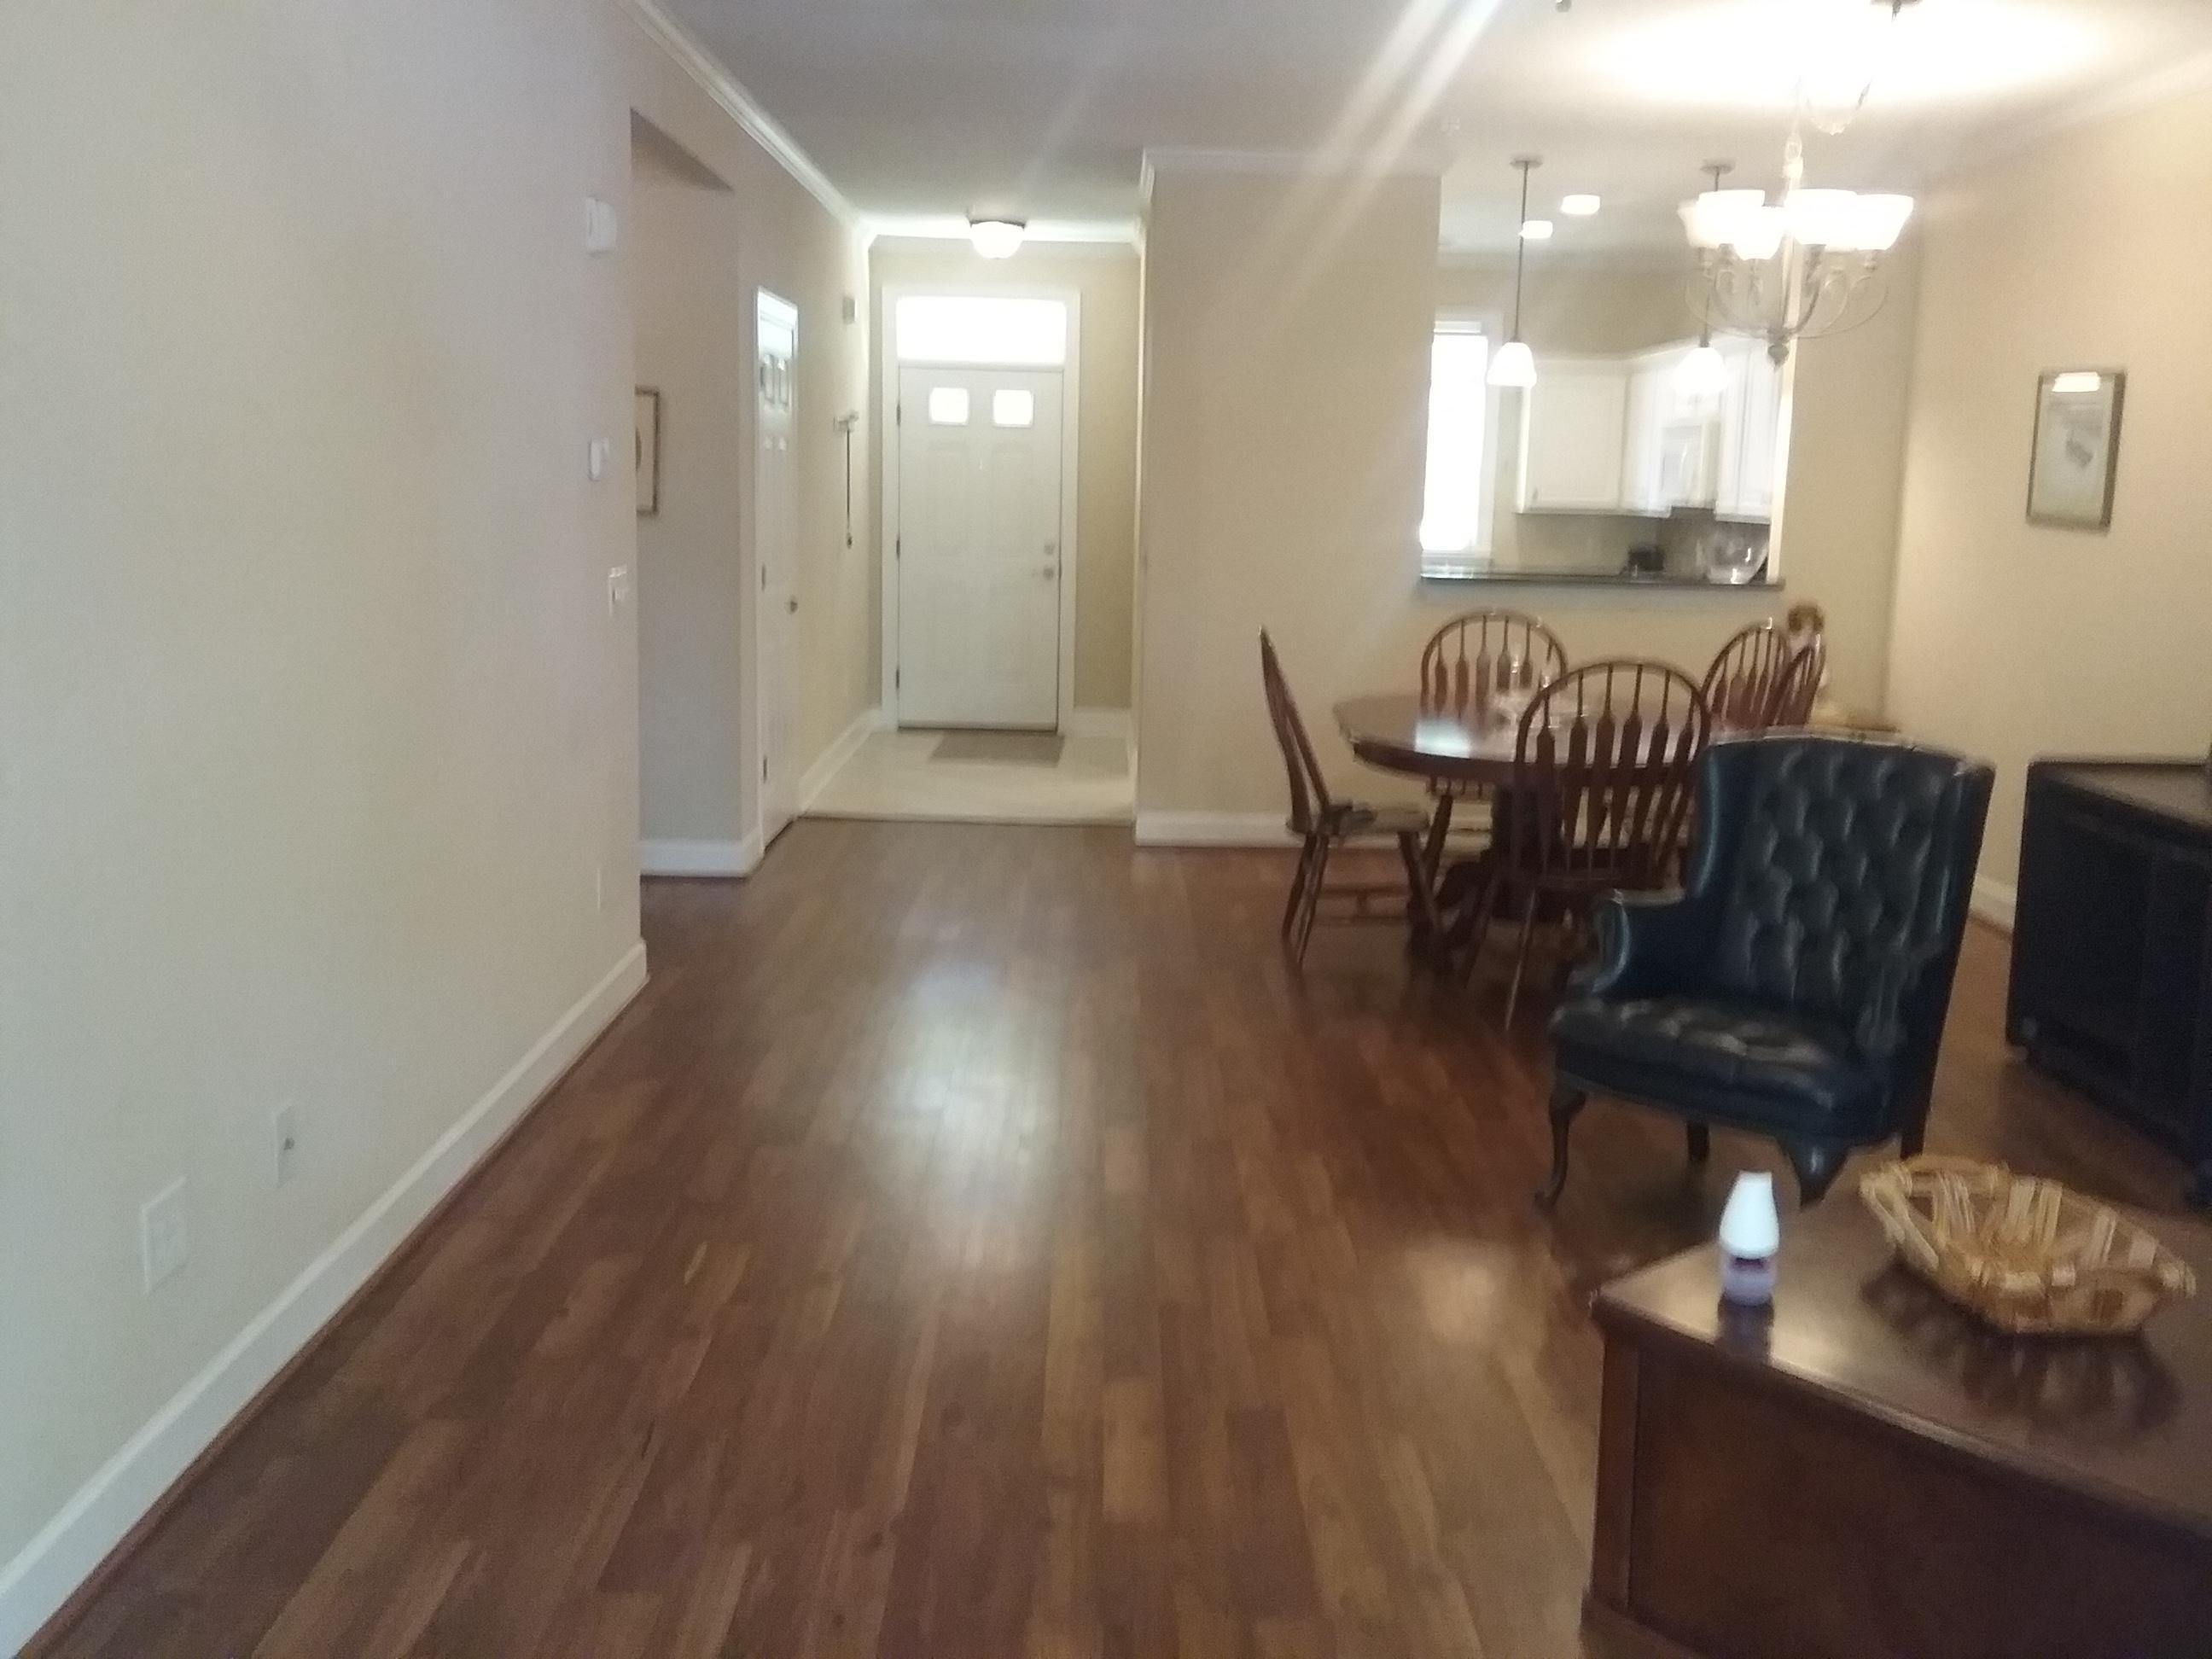 Ballards Pointe II Homes For Sale - 103 Ballard, Santee, SC - 42